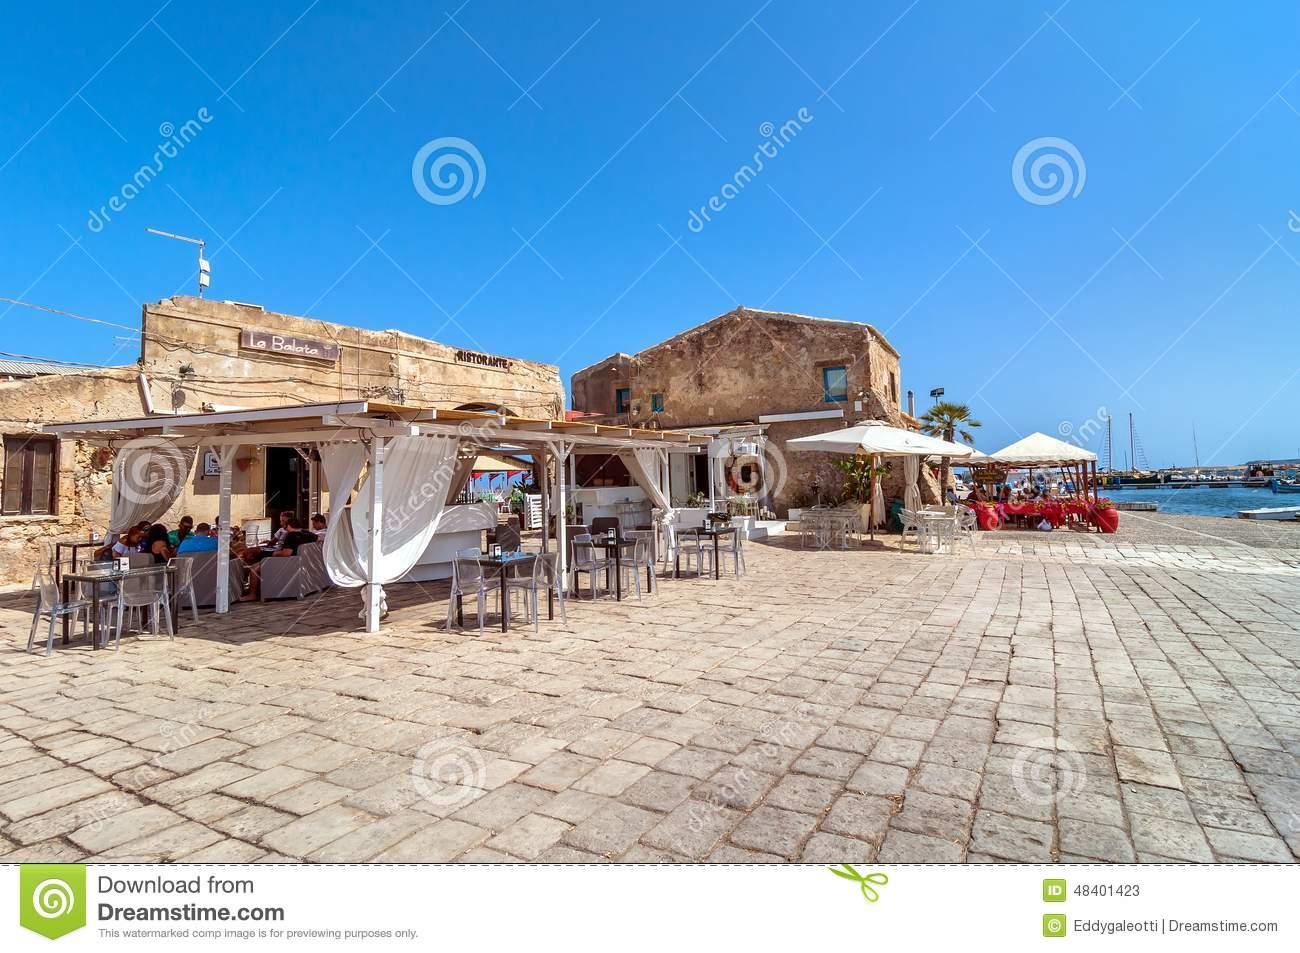 Marzamemi Small Fishing Village In Southeastern Sicily.